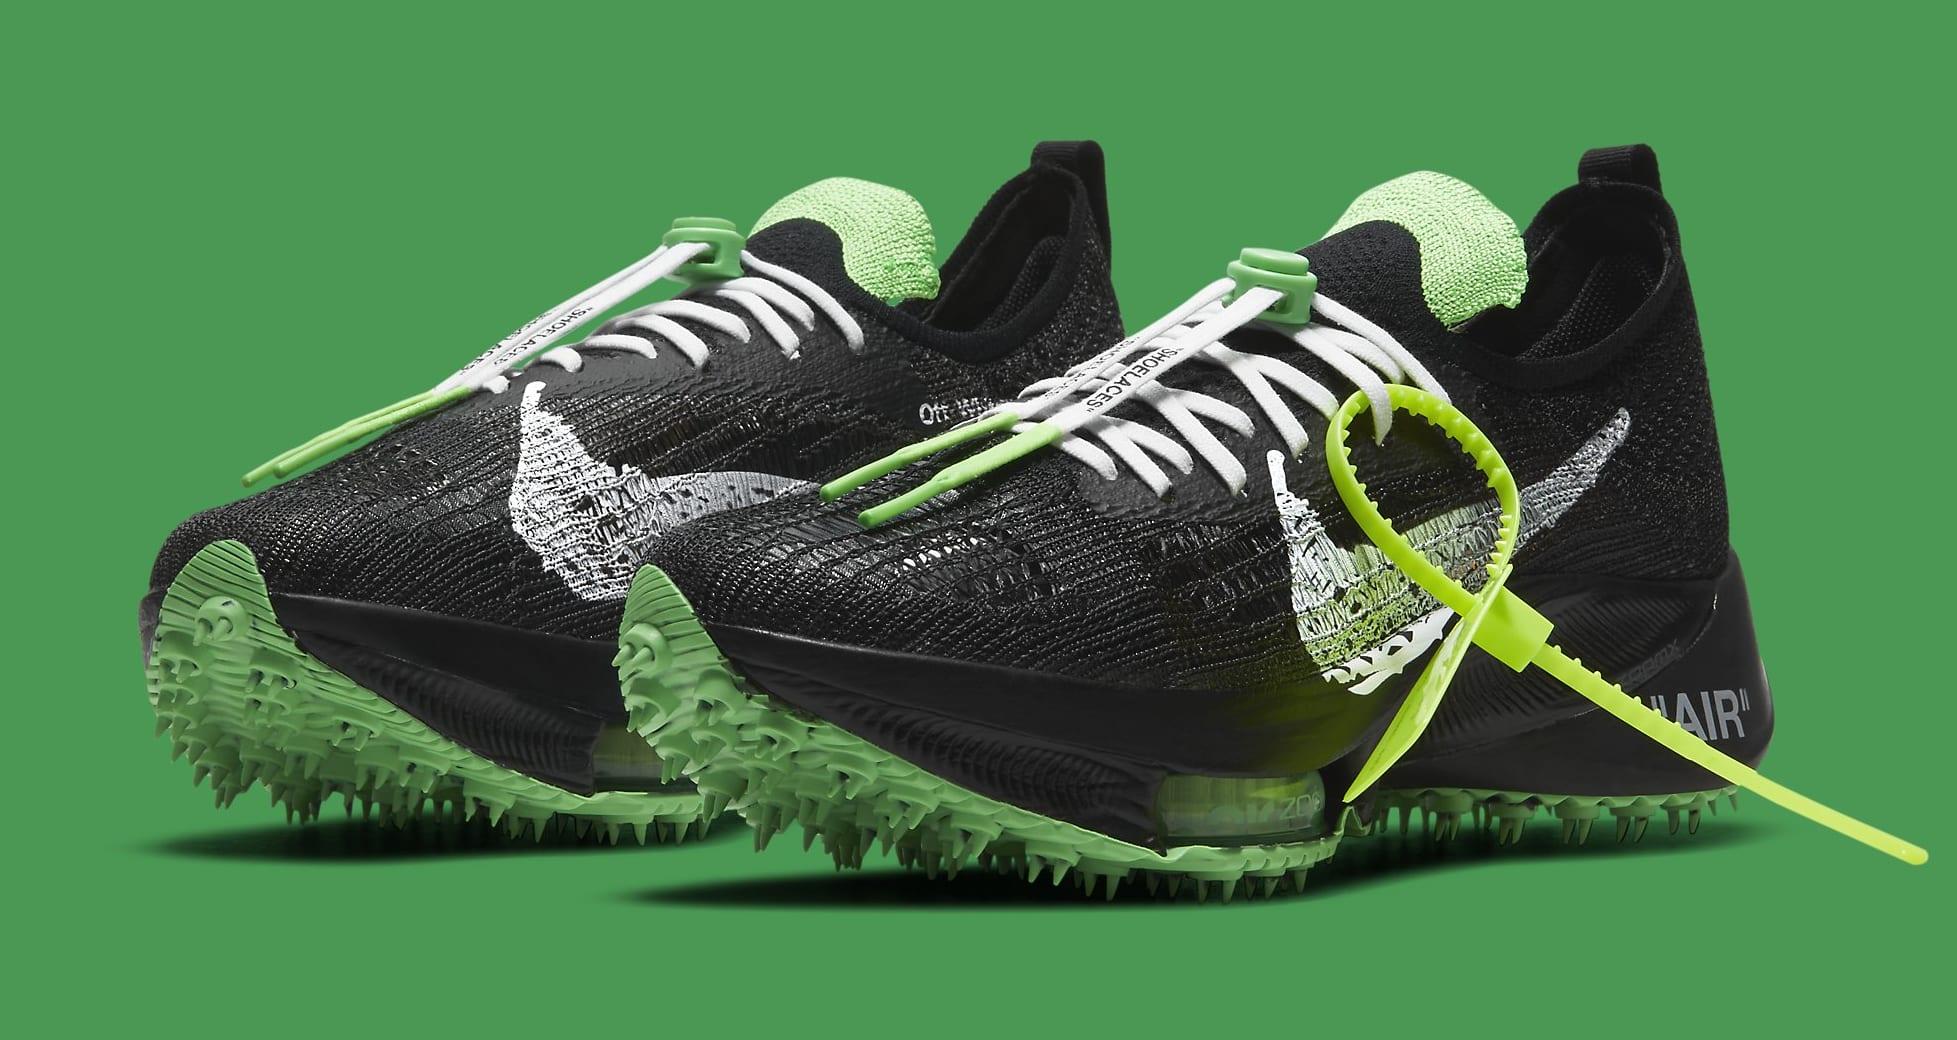 Off-White x Nike Air Zoom Tempo Next% CV0697-001 Pair